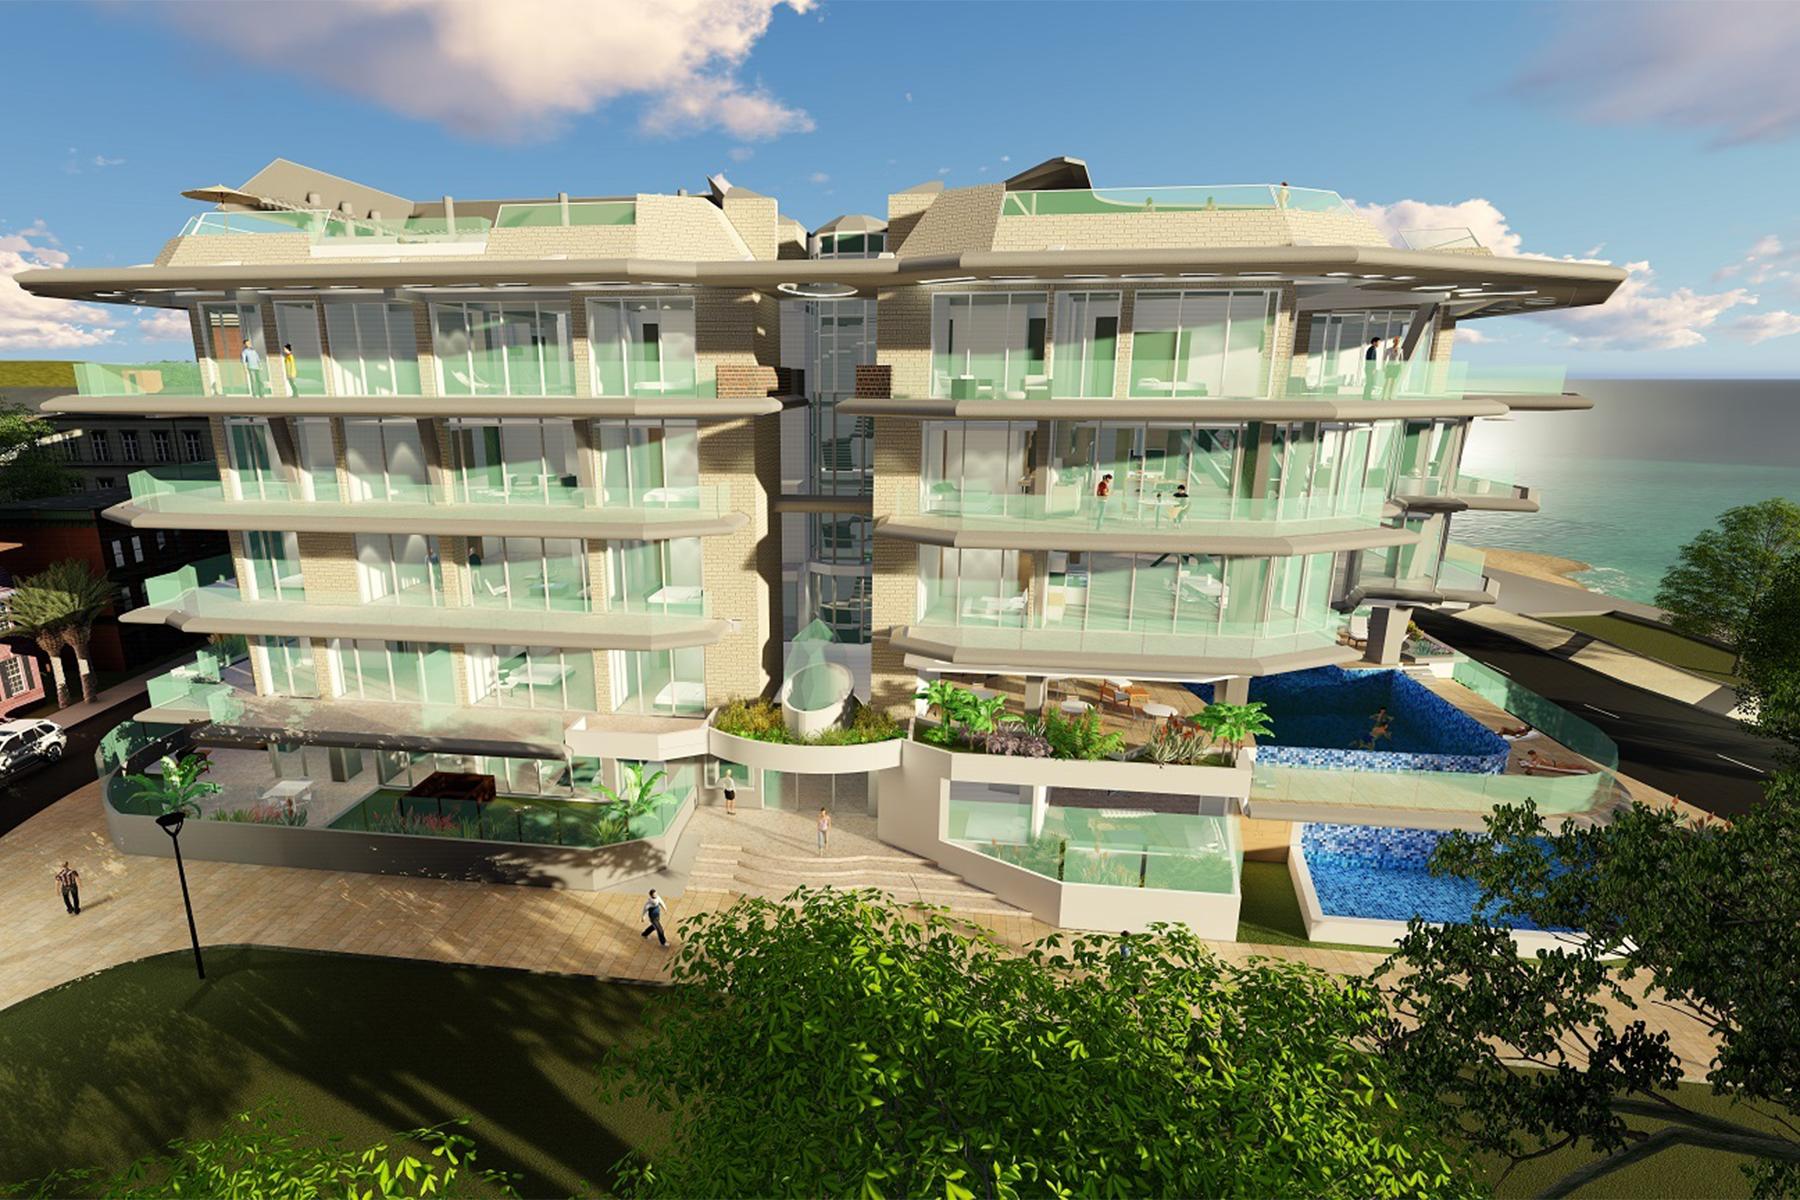 Additional photo for property listing at Coral Shell 2 bedroom unit Oranjestad, Aruba Aruba